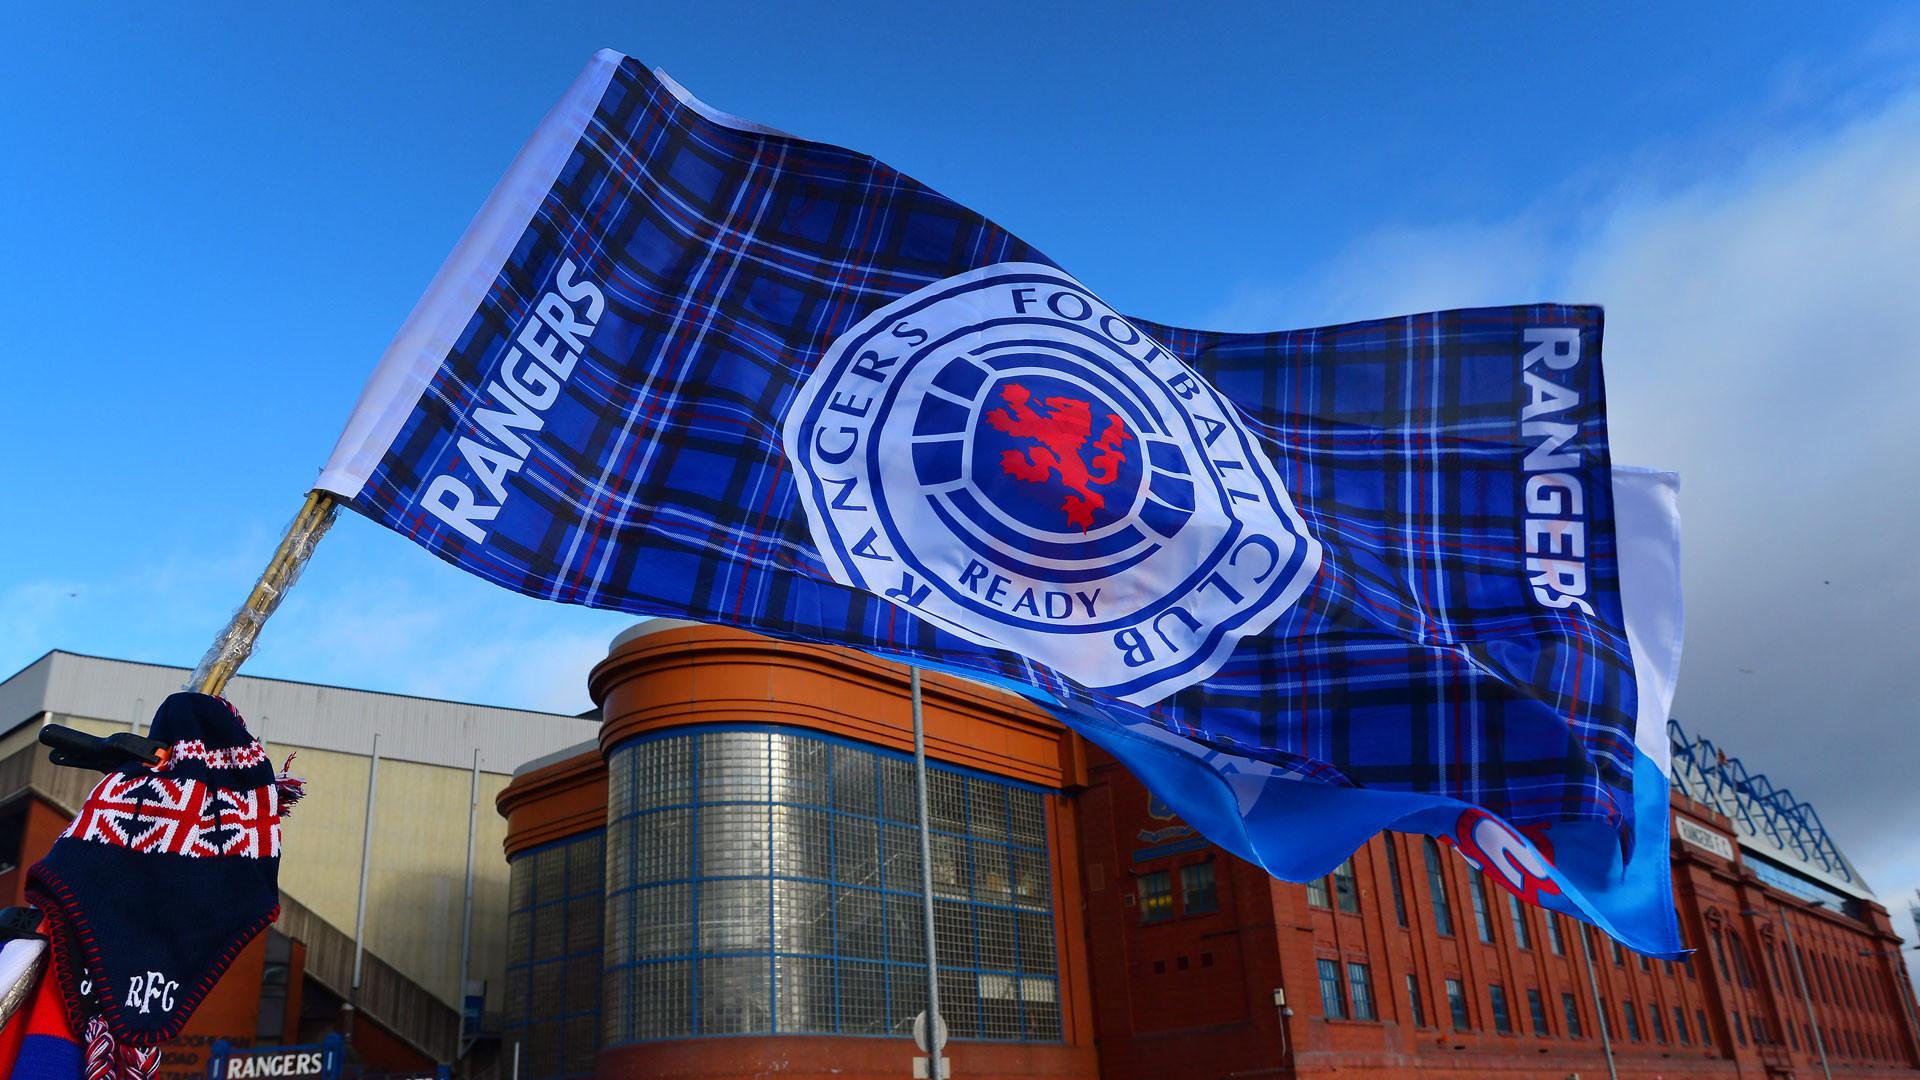 Glasgow Rangers Wallpaper 59 Images